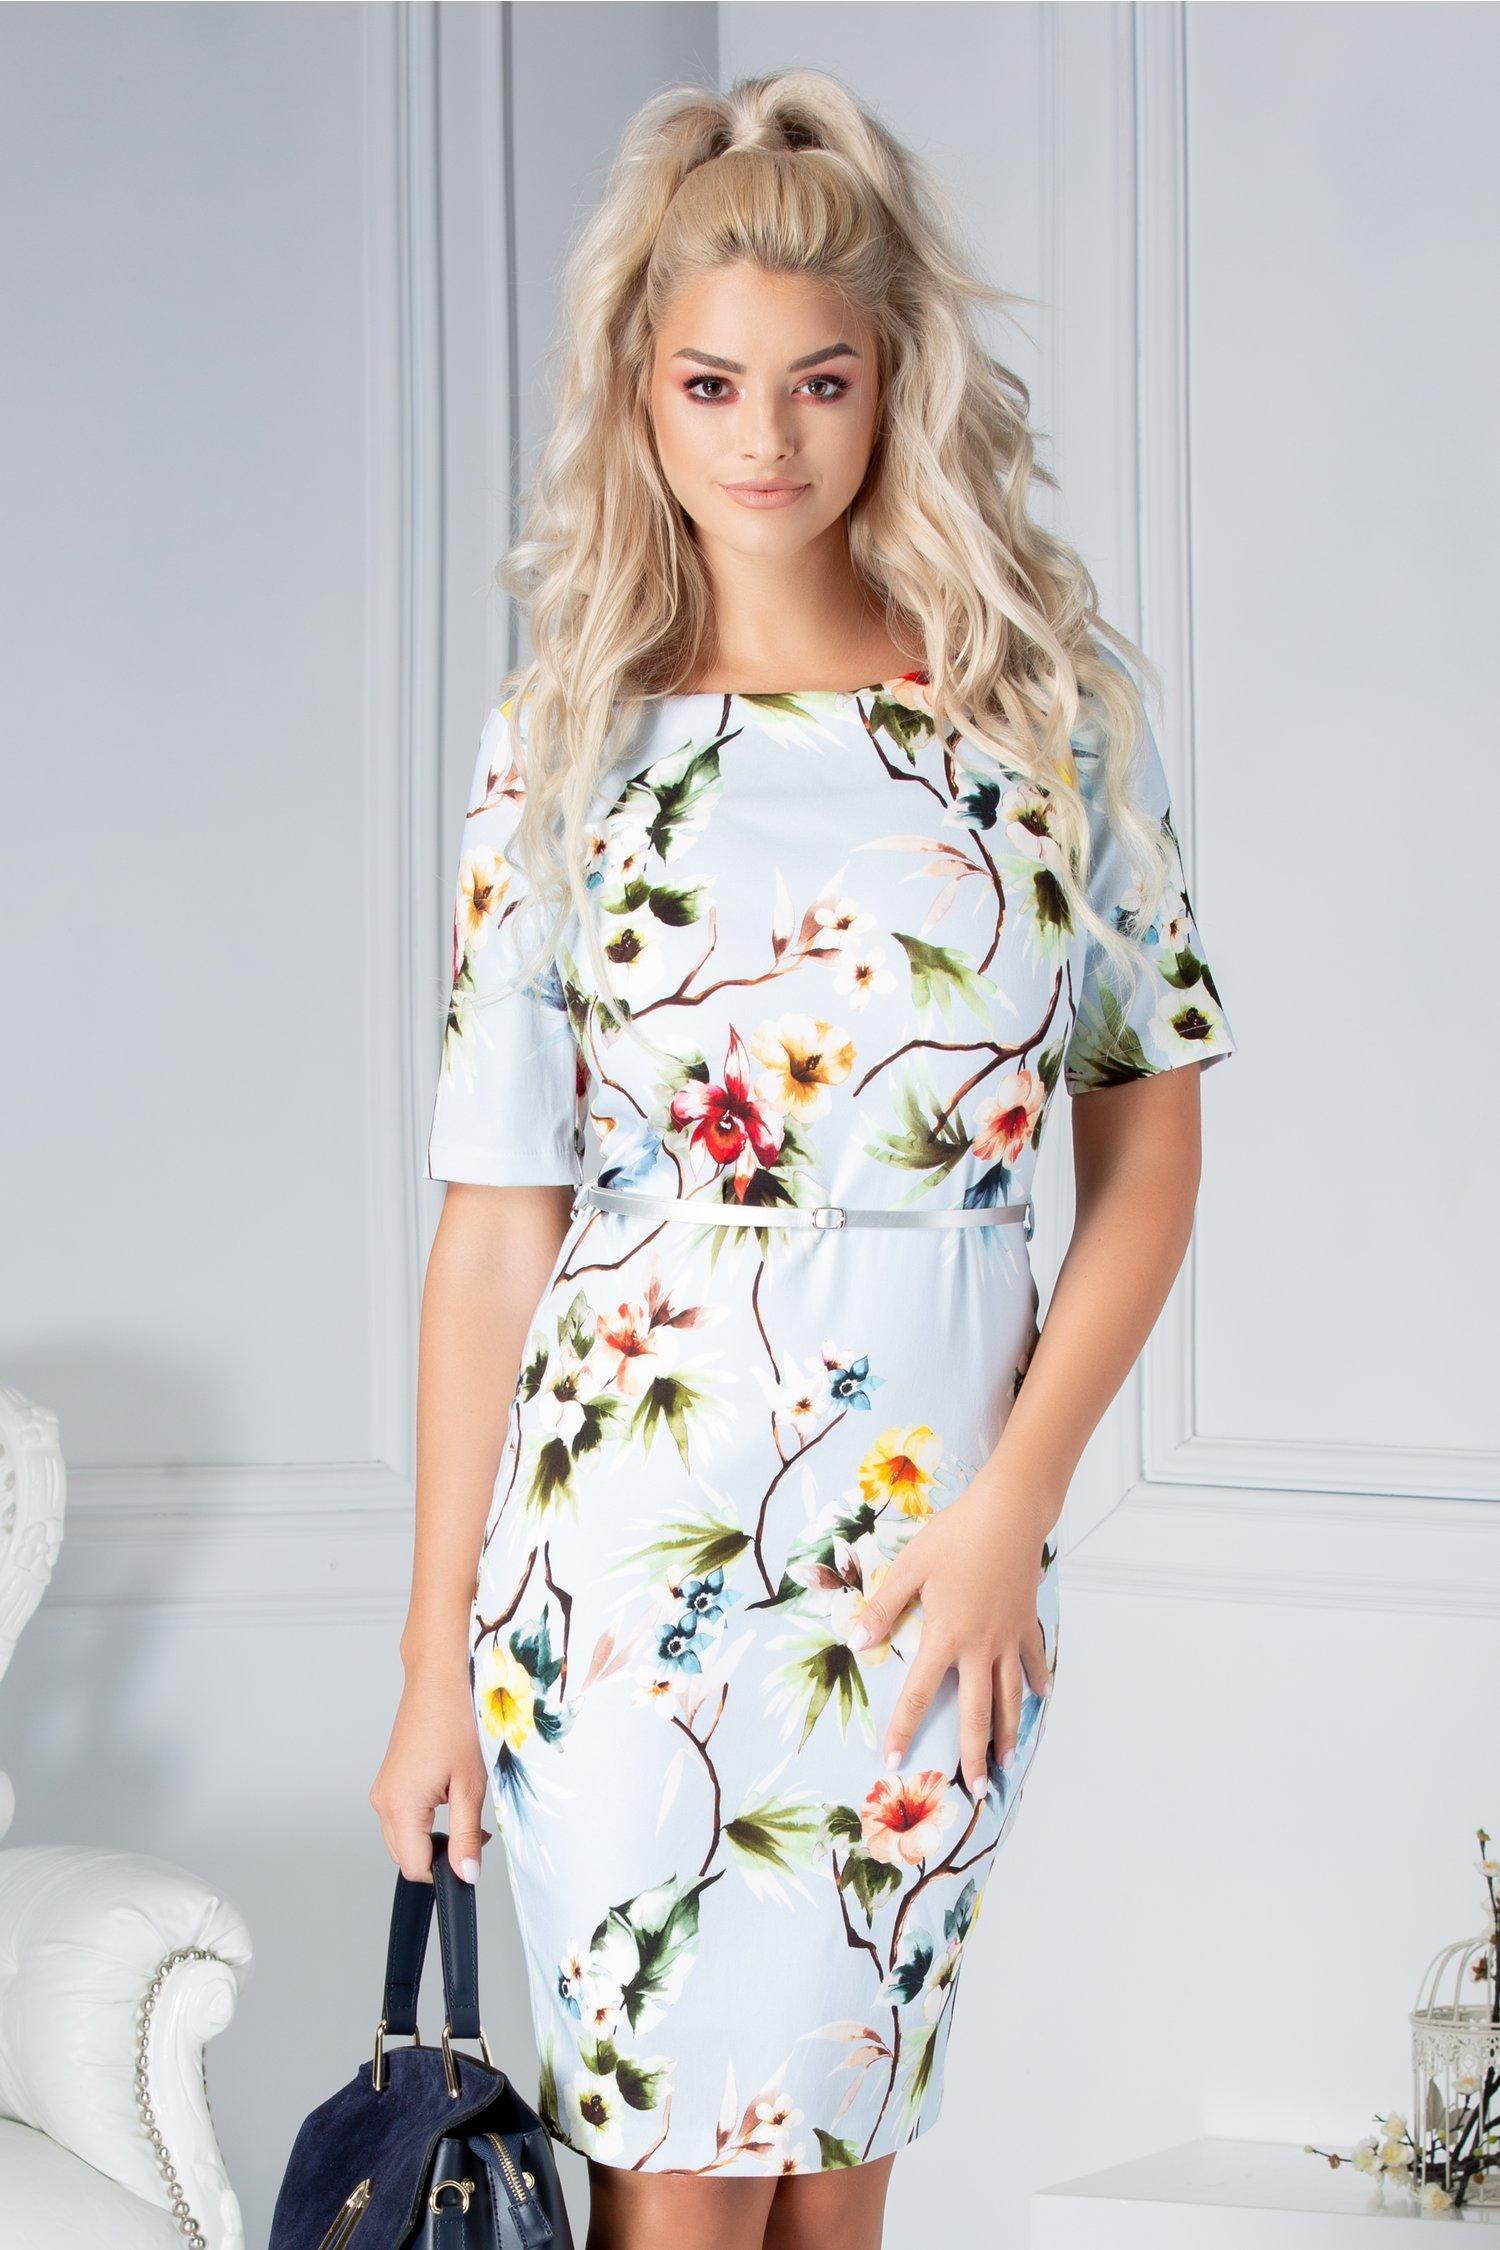 Rochie Lize tte bleu cu imprimeu floral colorat